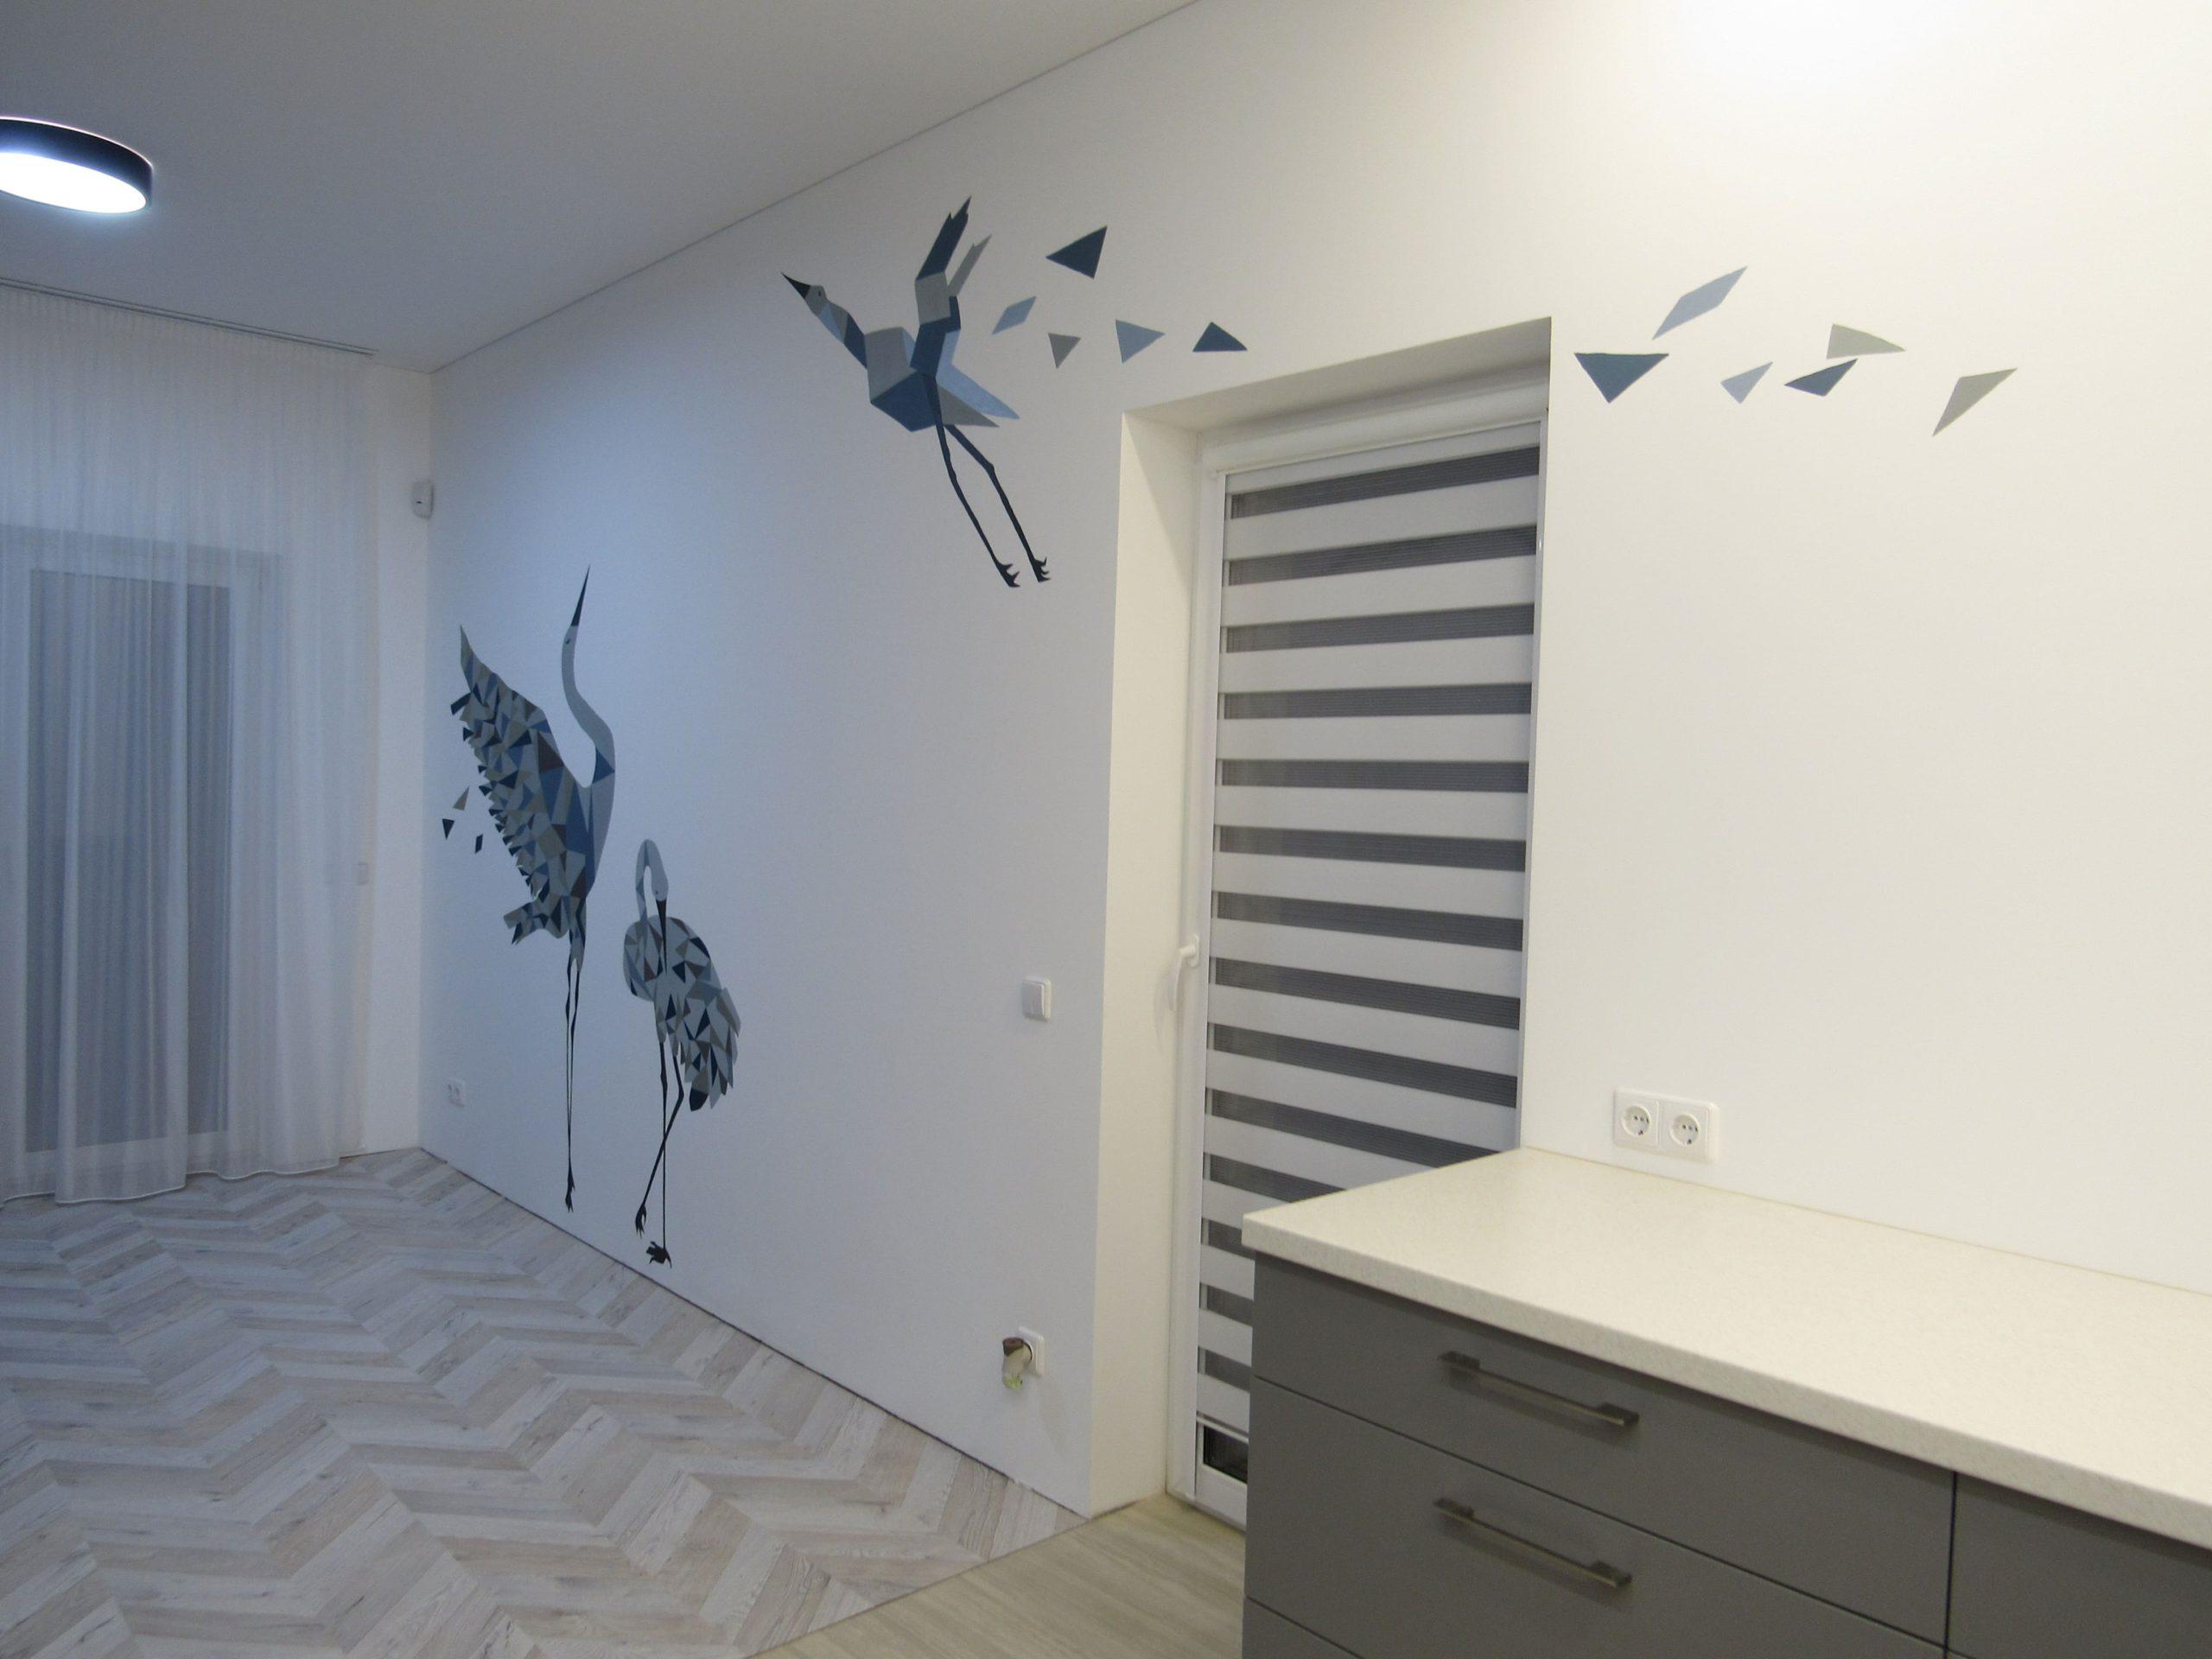 menine-kuryba-sienu-dekoravimas-ivairus-interjerai (7)